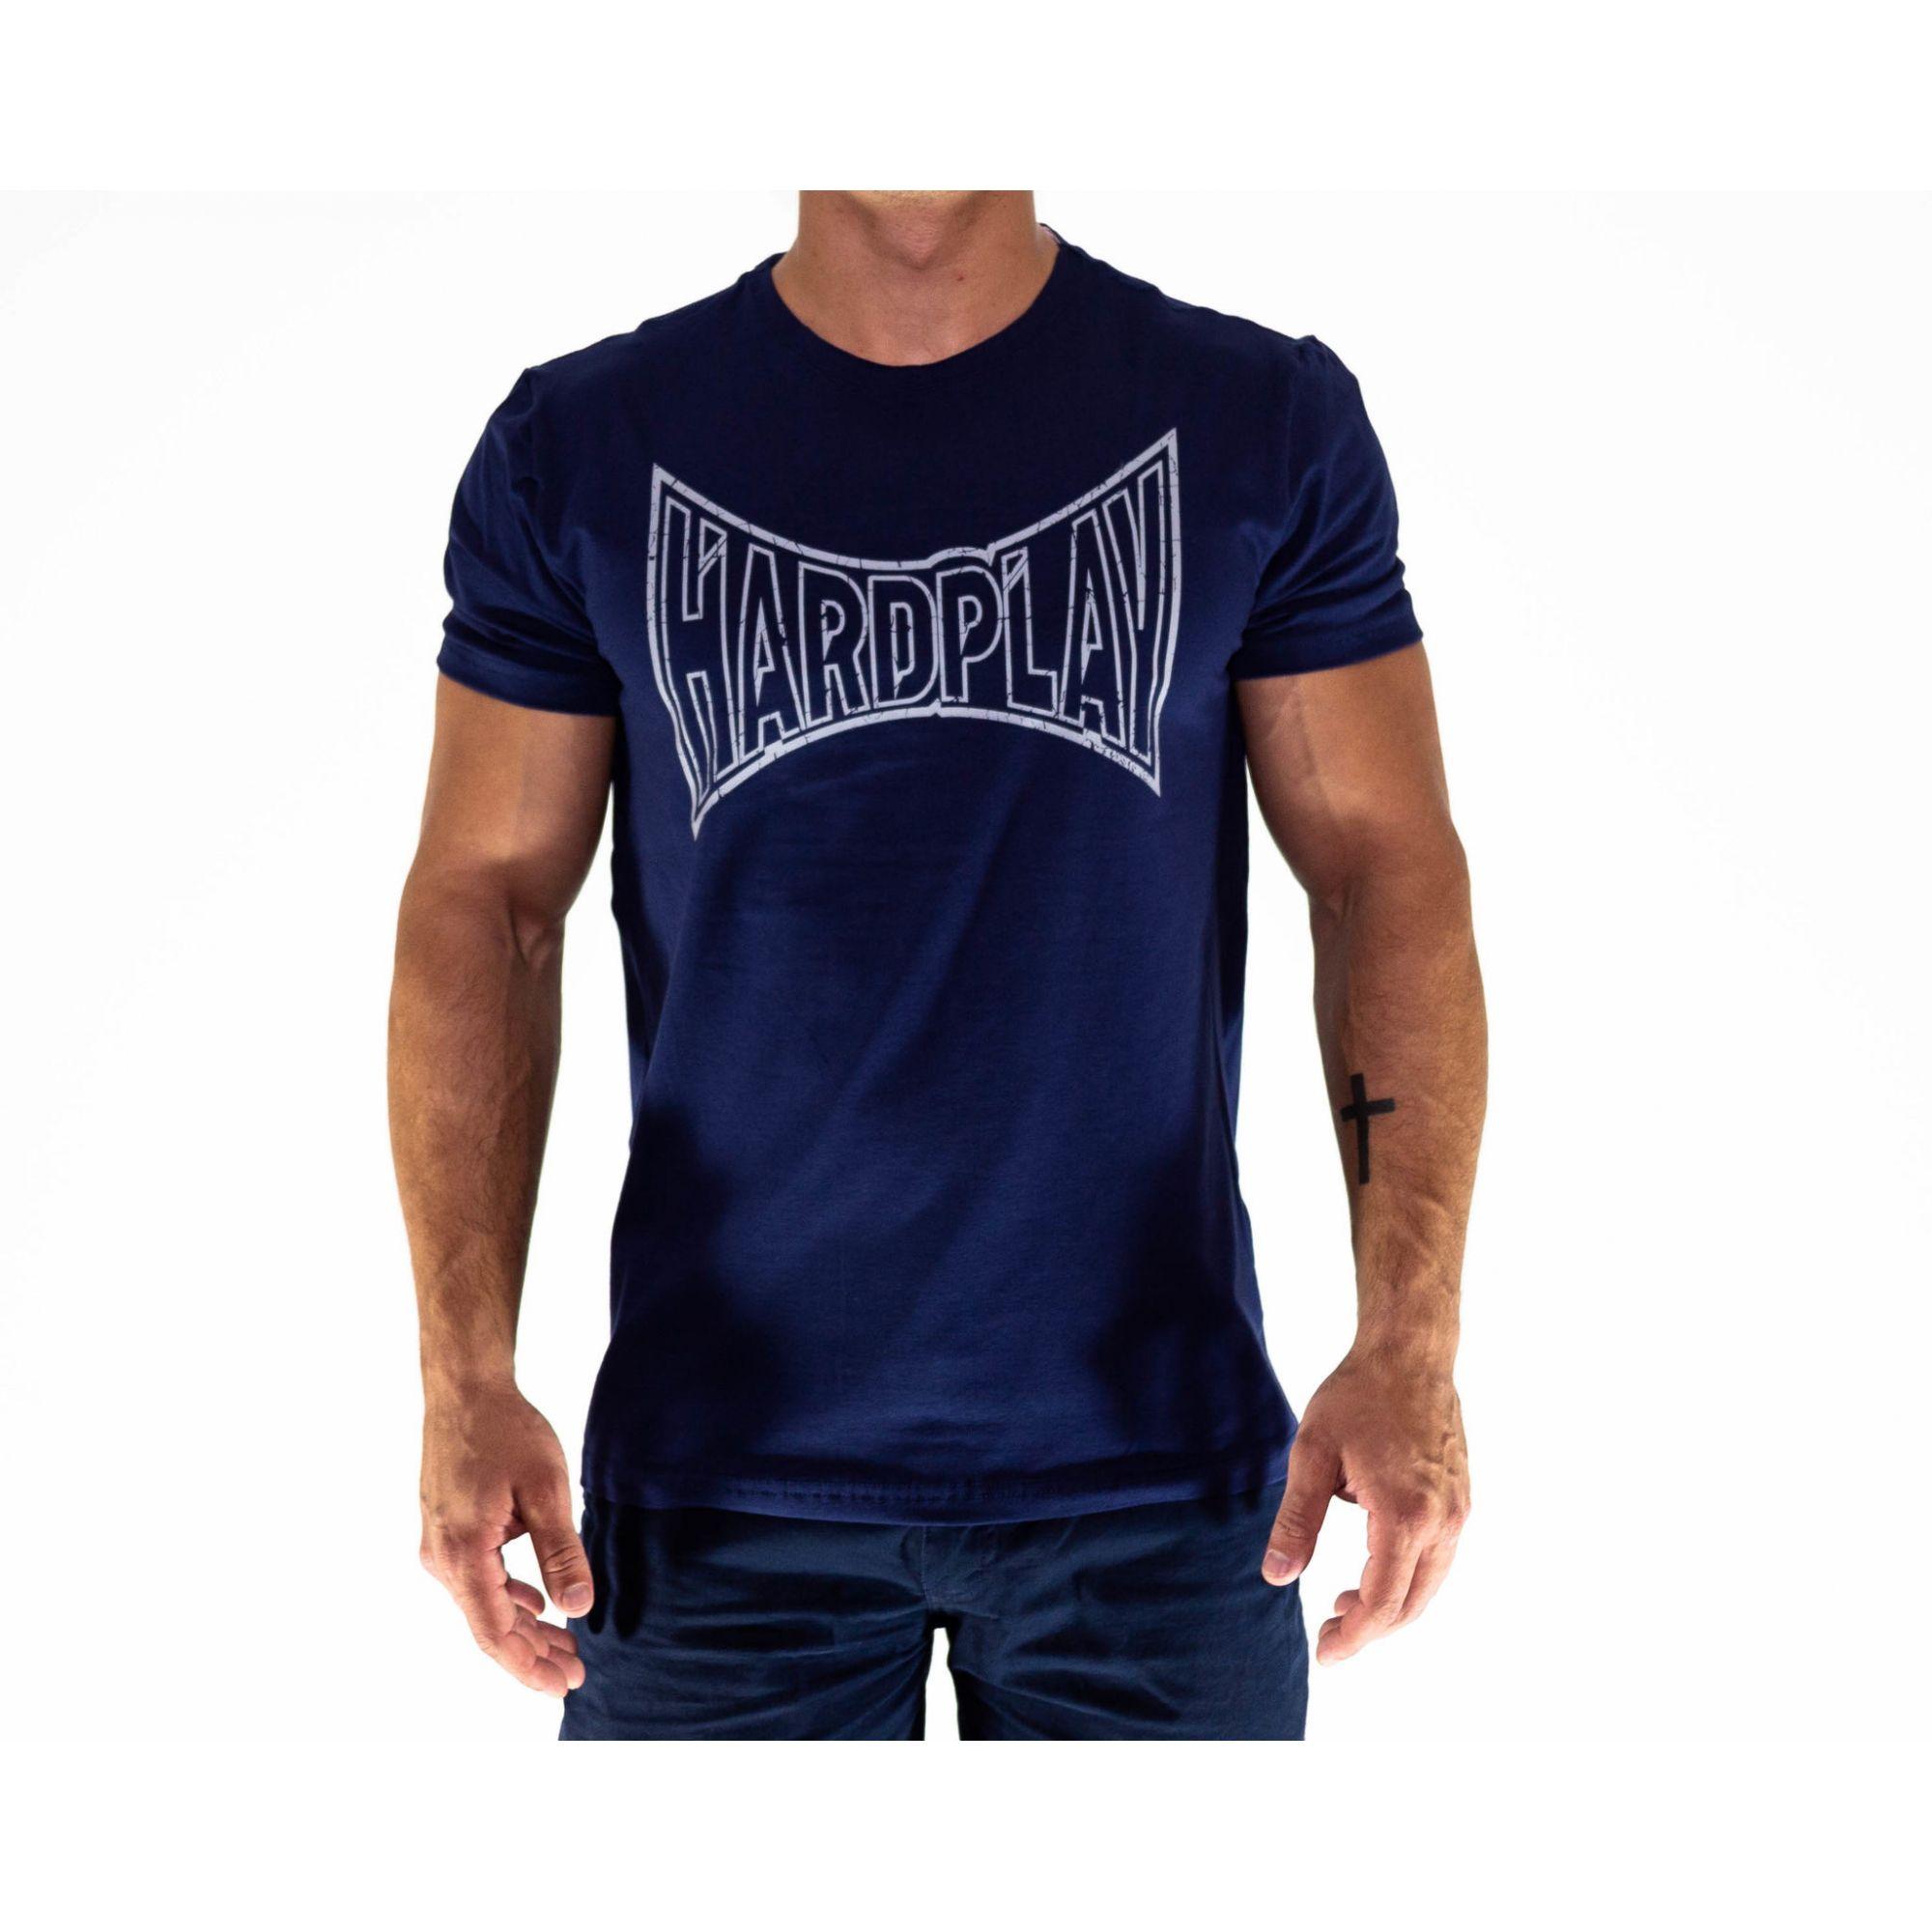 Camiseta HardPlay Azul Marinho